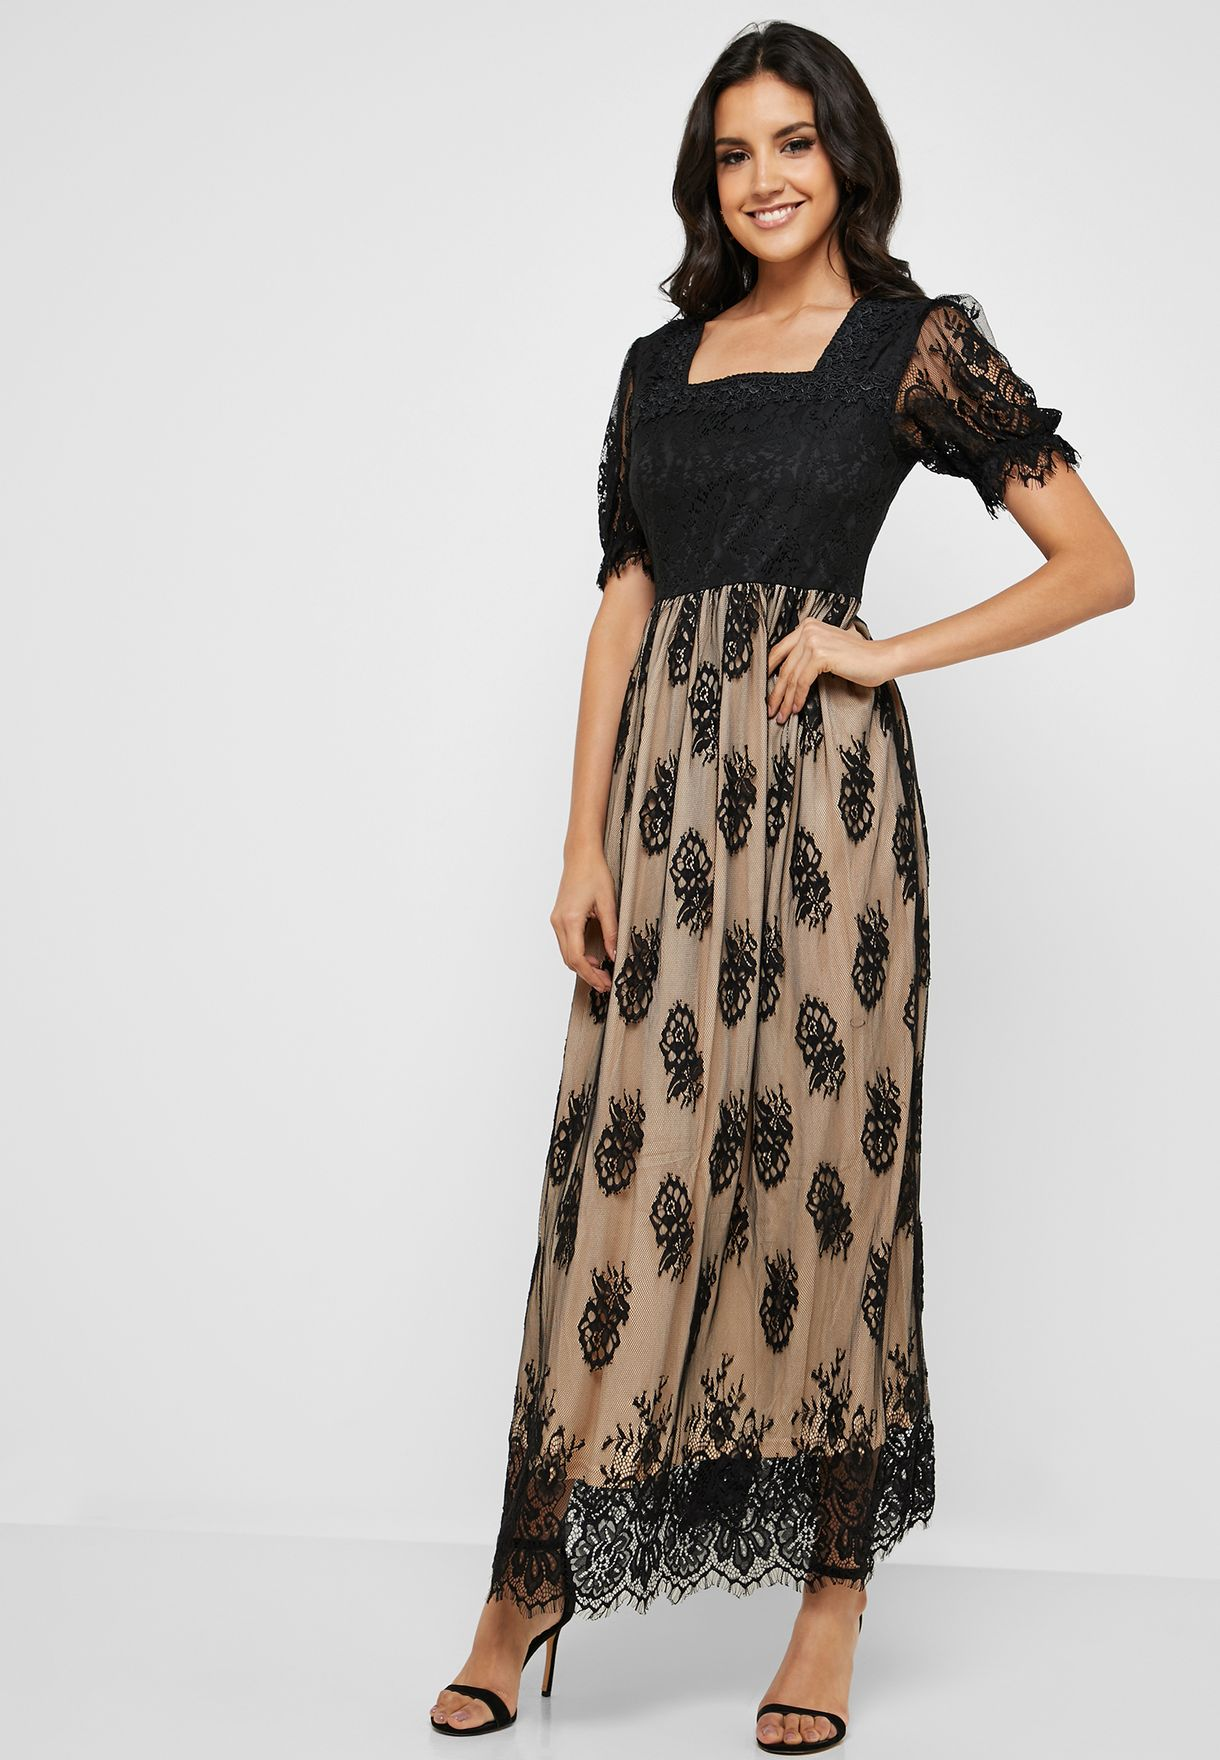 782da744c9f Shop Rina multicolor Lace Overlay Maxi Dress 01011930905 for Women ...